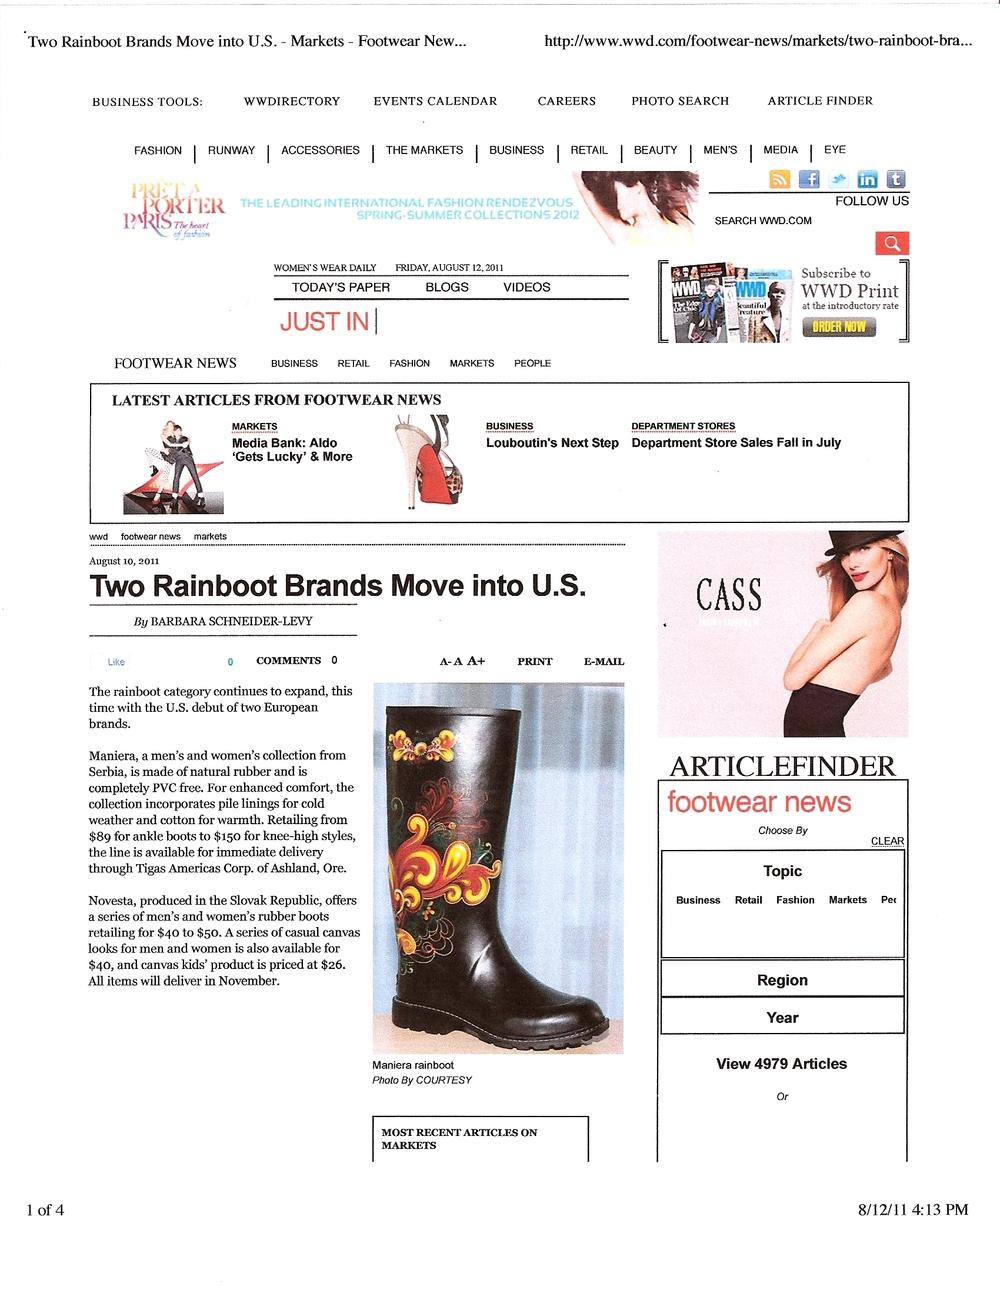 Maniera_Footwear_News_August_10_2011.jpg